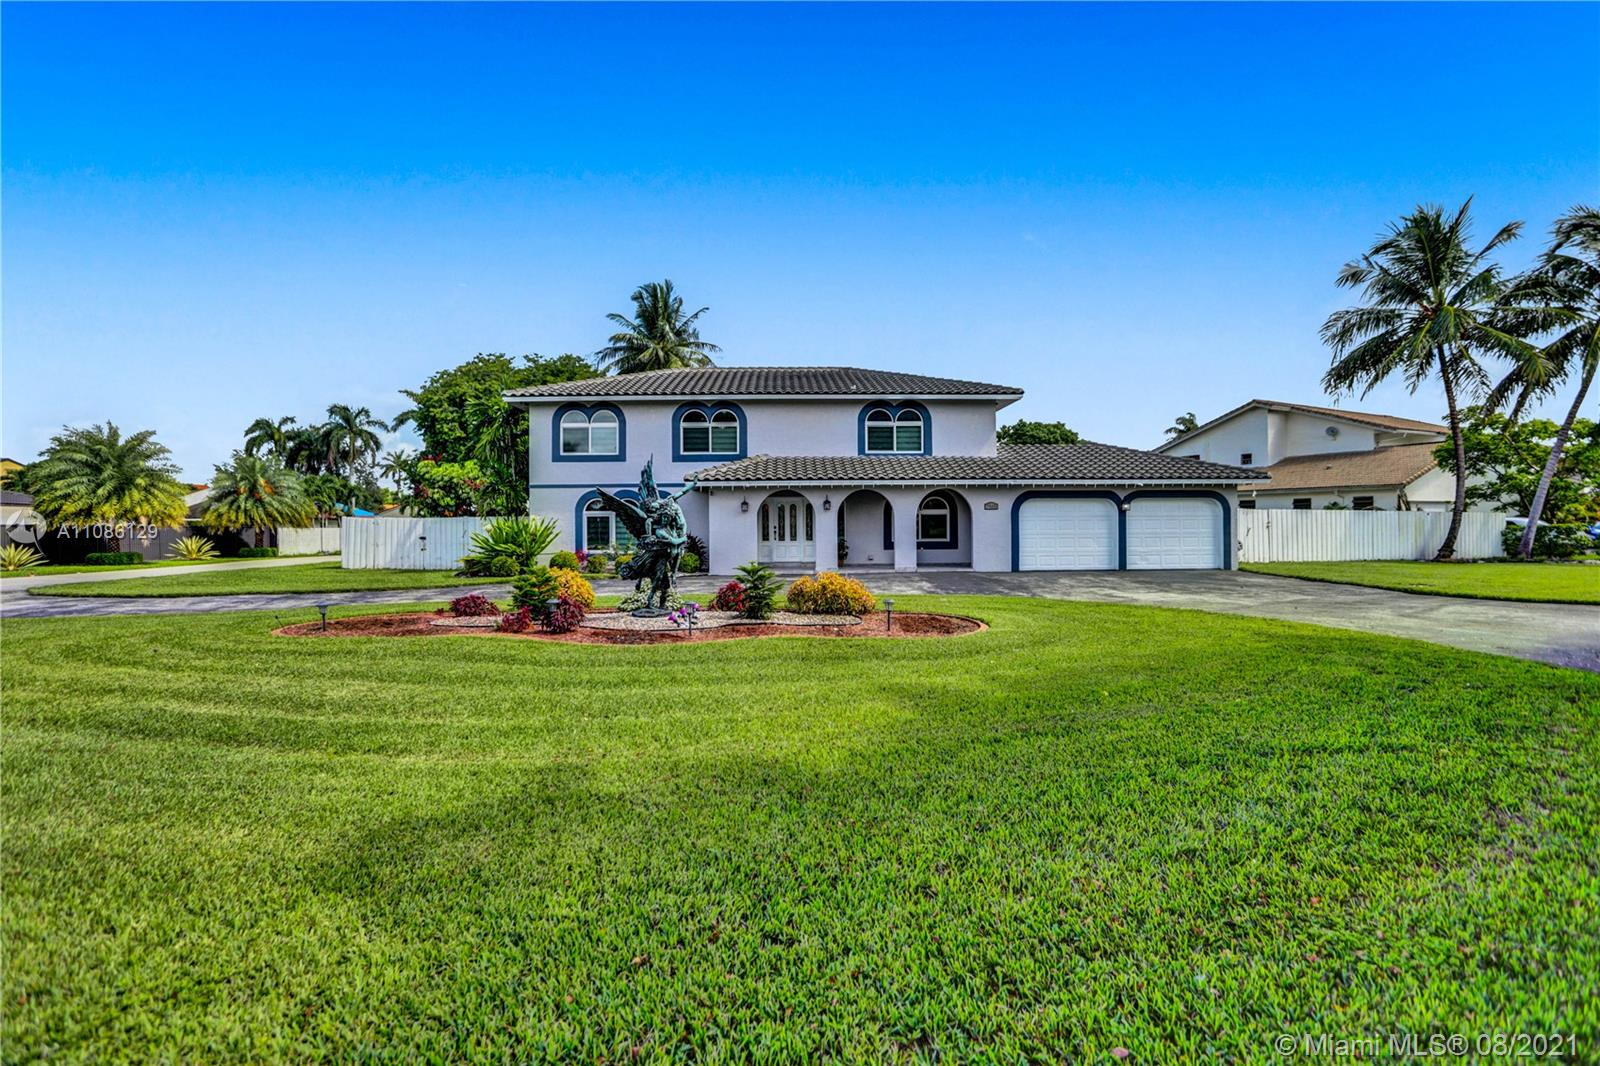 Country Club Of Miam - 7515 N Oakmont Dr, Hialeah, FL 33015